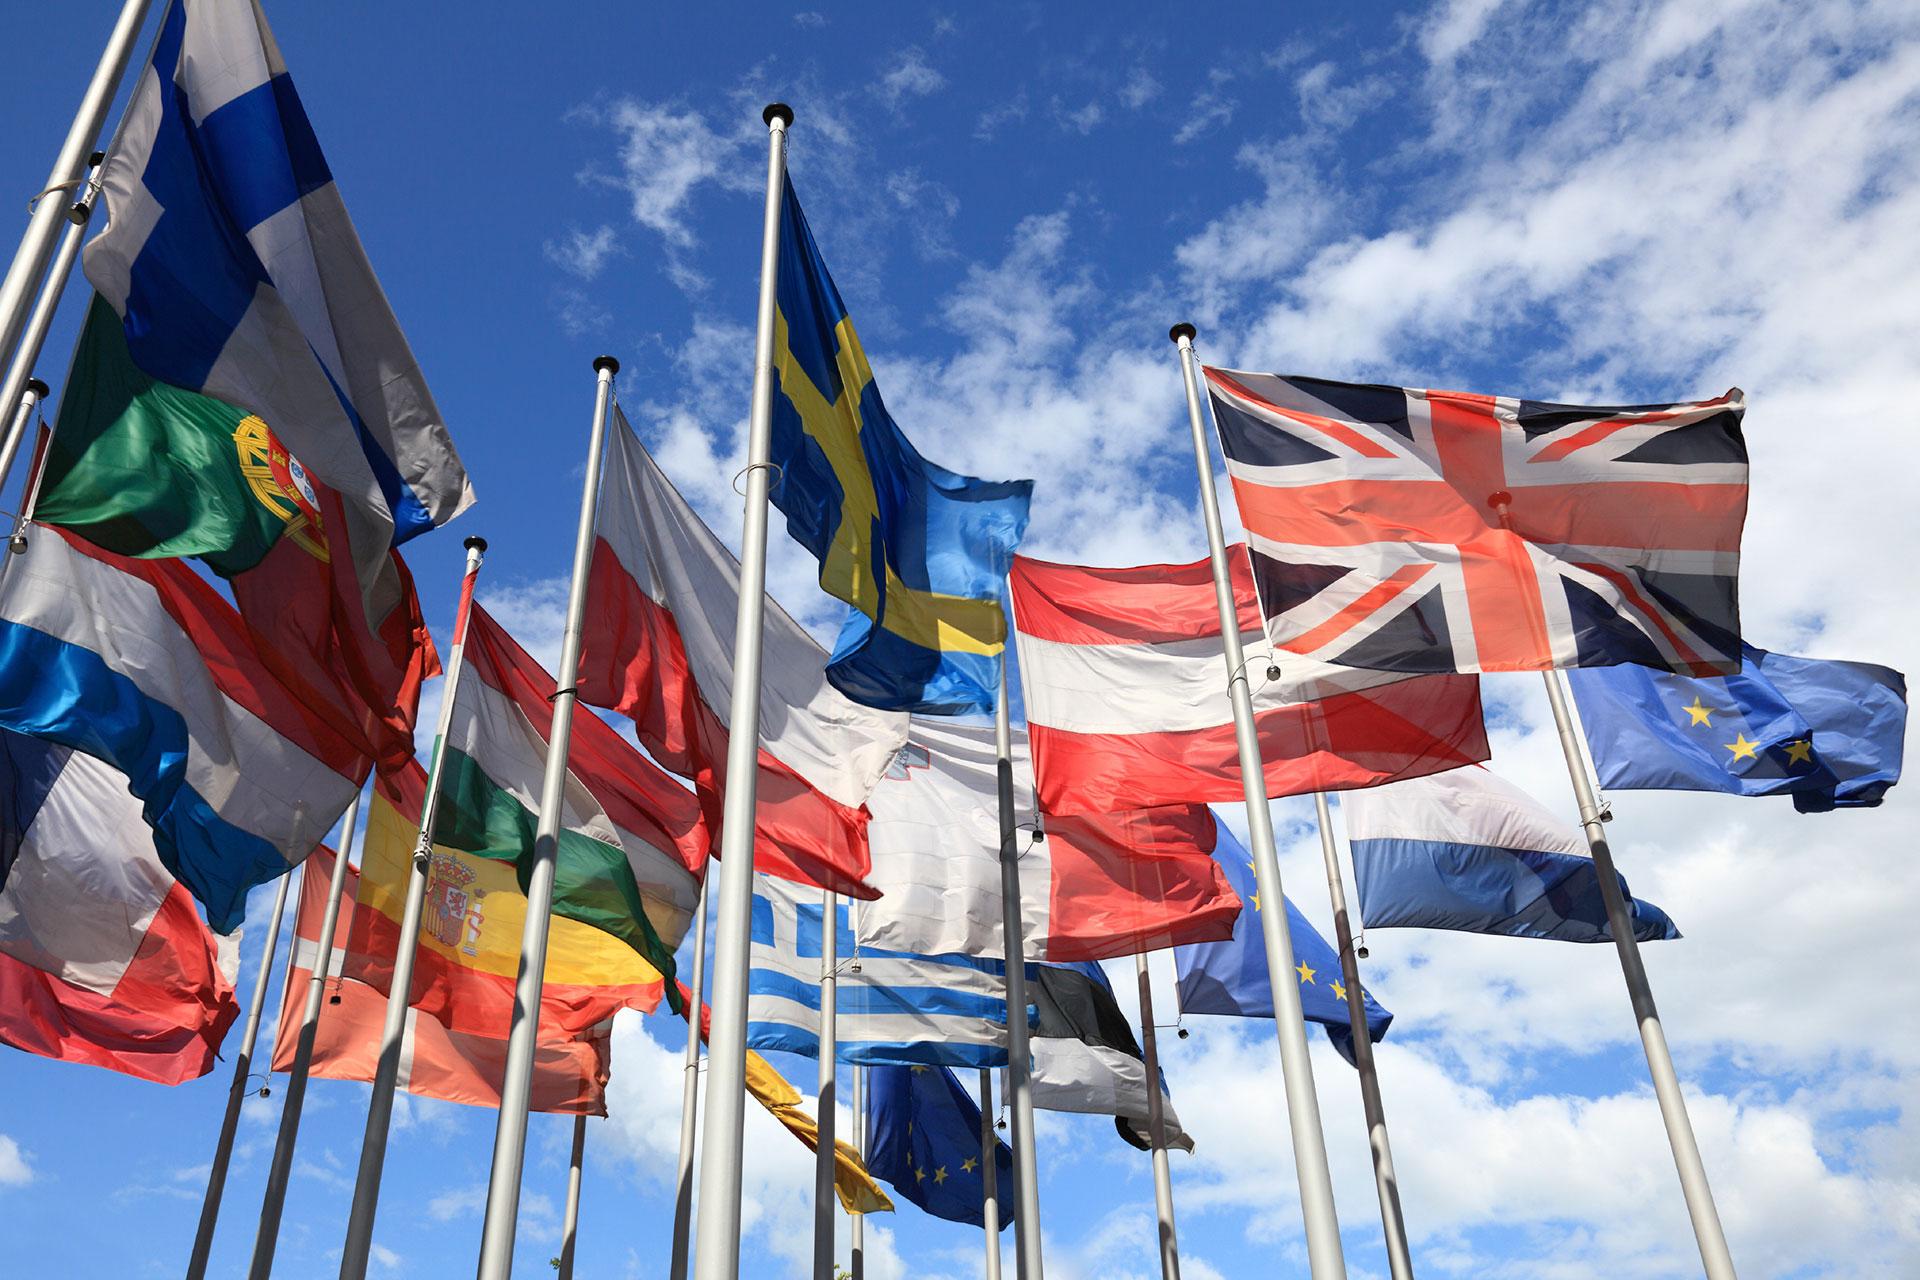 european flags in wind 000011998719 1920x1080 v4